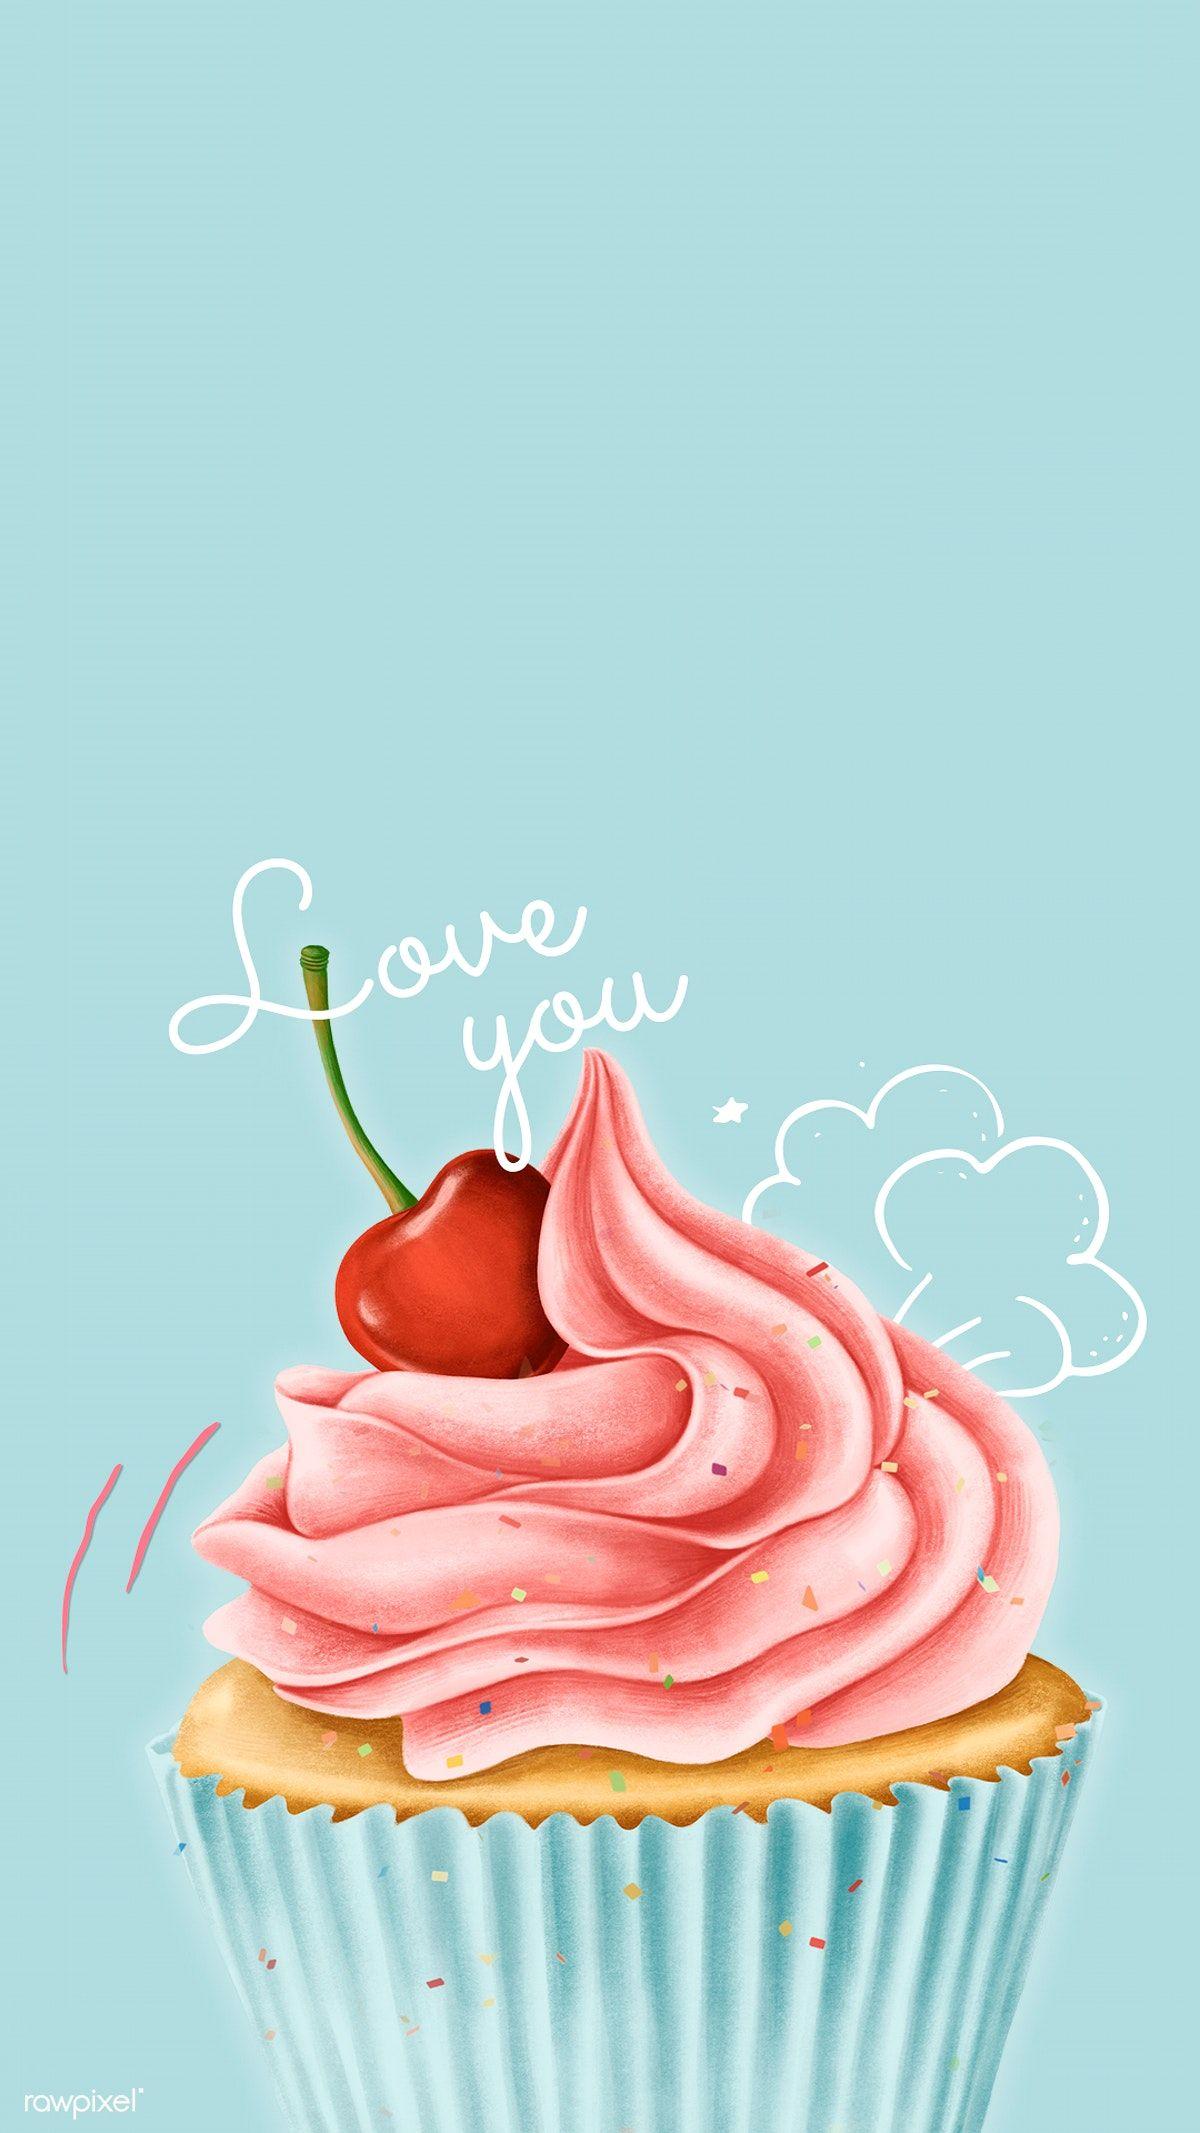 Graham Brown Pastels 30 236 Cupcake Contour Wallpaper Cupcakes Wallpaper Wall Candy Wallpaper